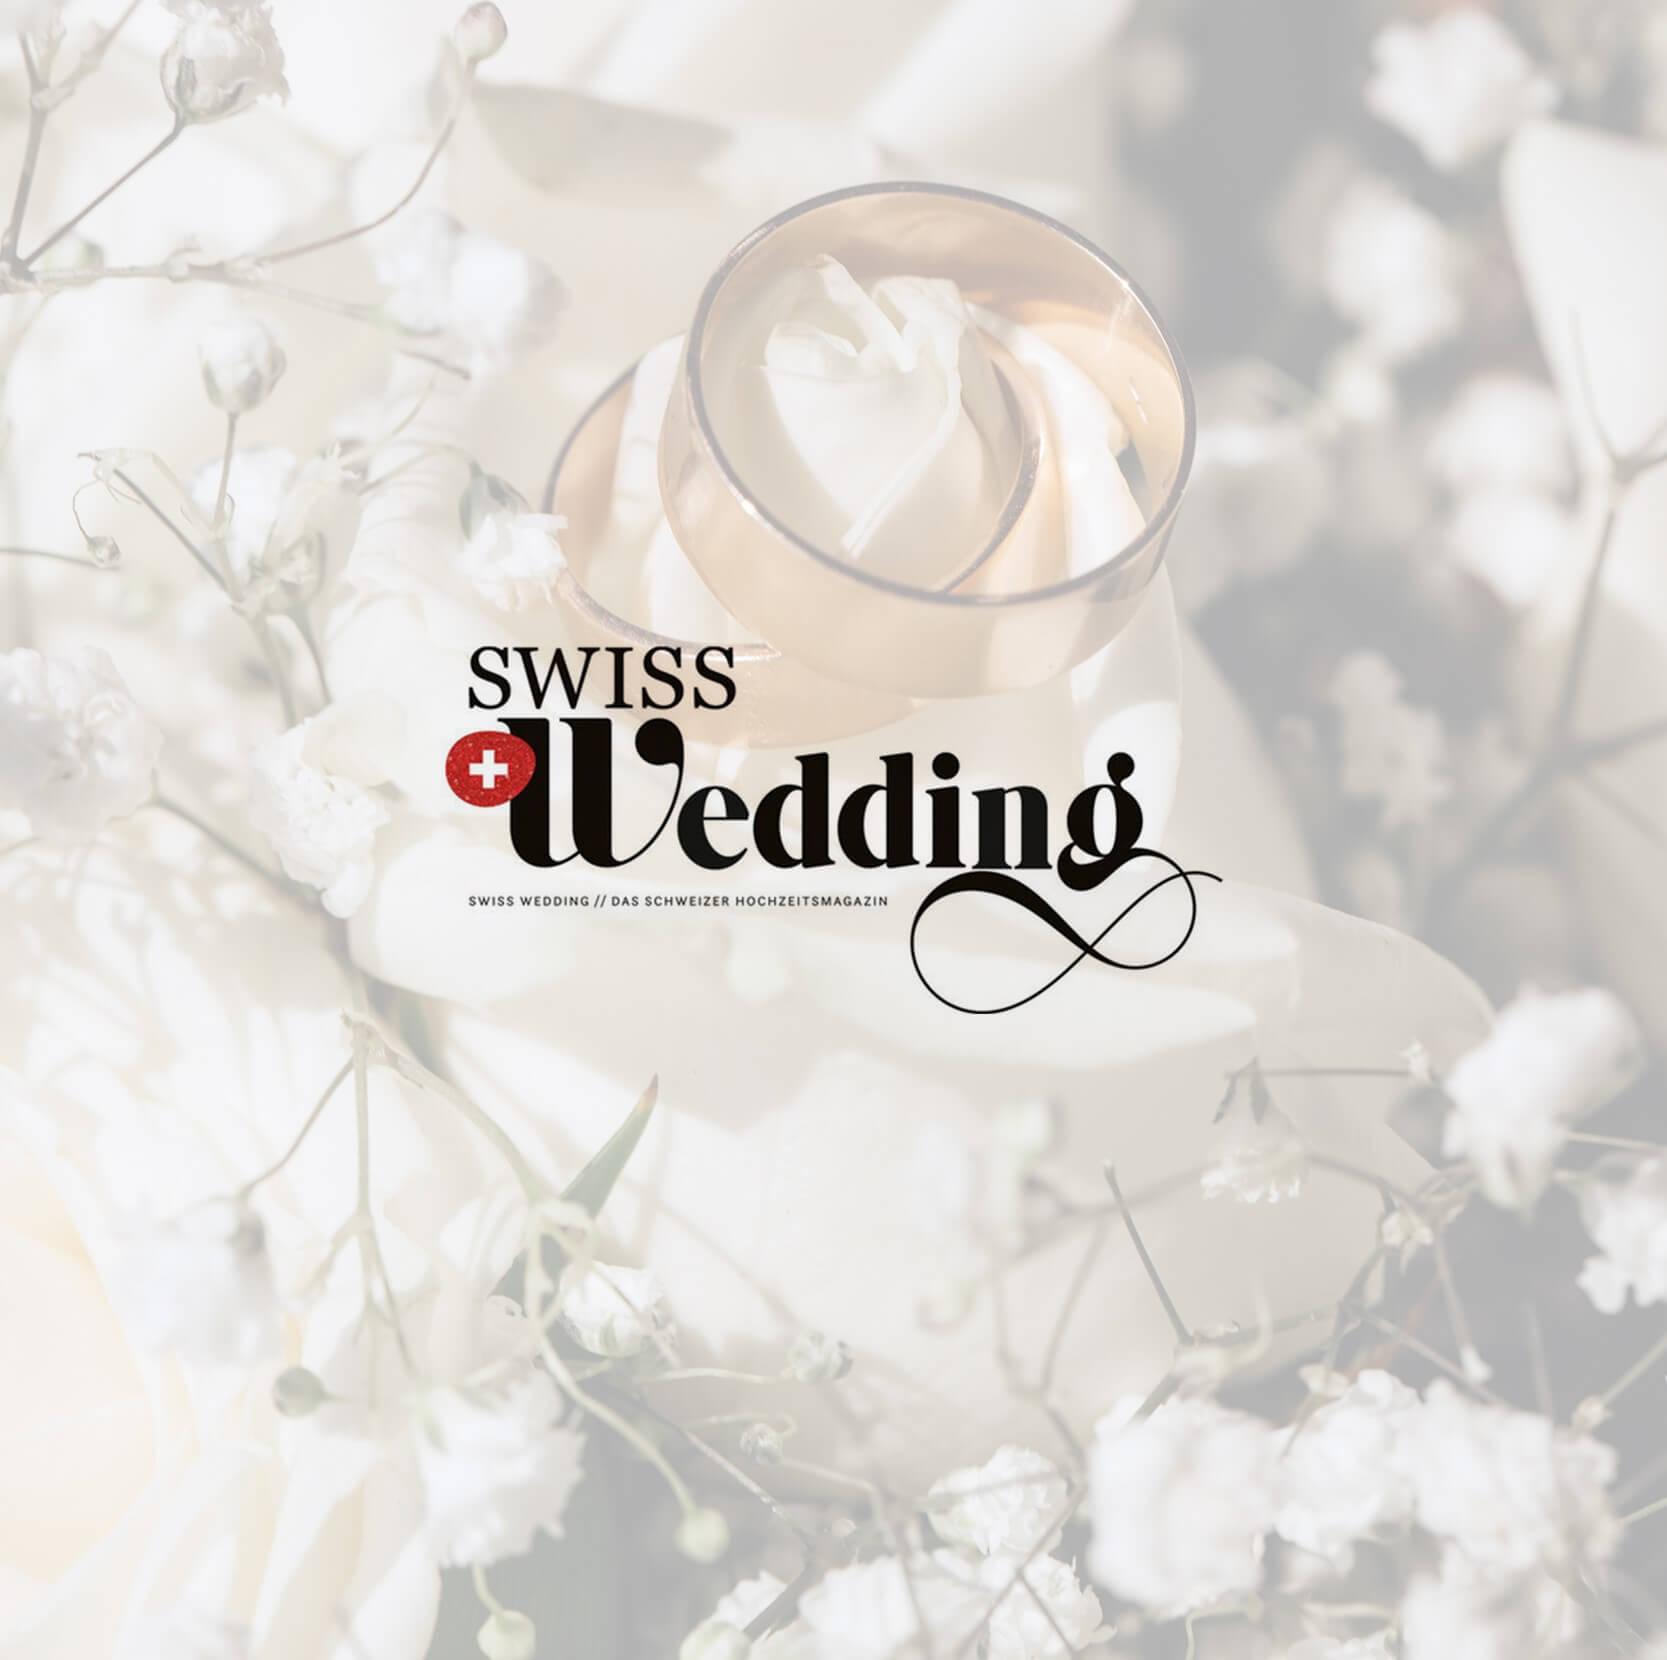 https://www.haar-werk.ch/wp-content/uploads/2020/12/Swisswedding_mobile-1.jpg